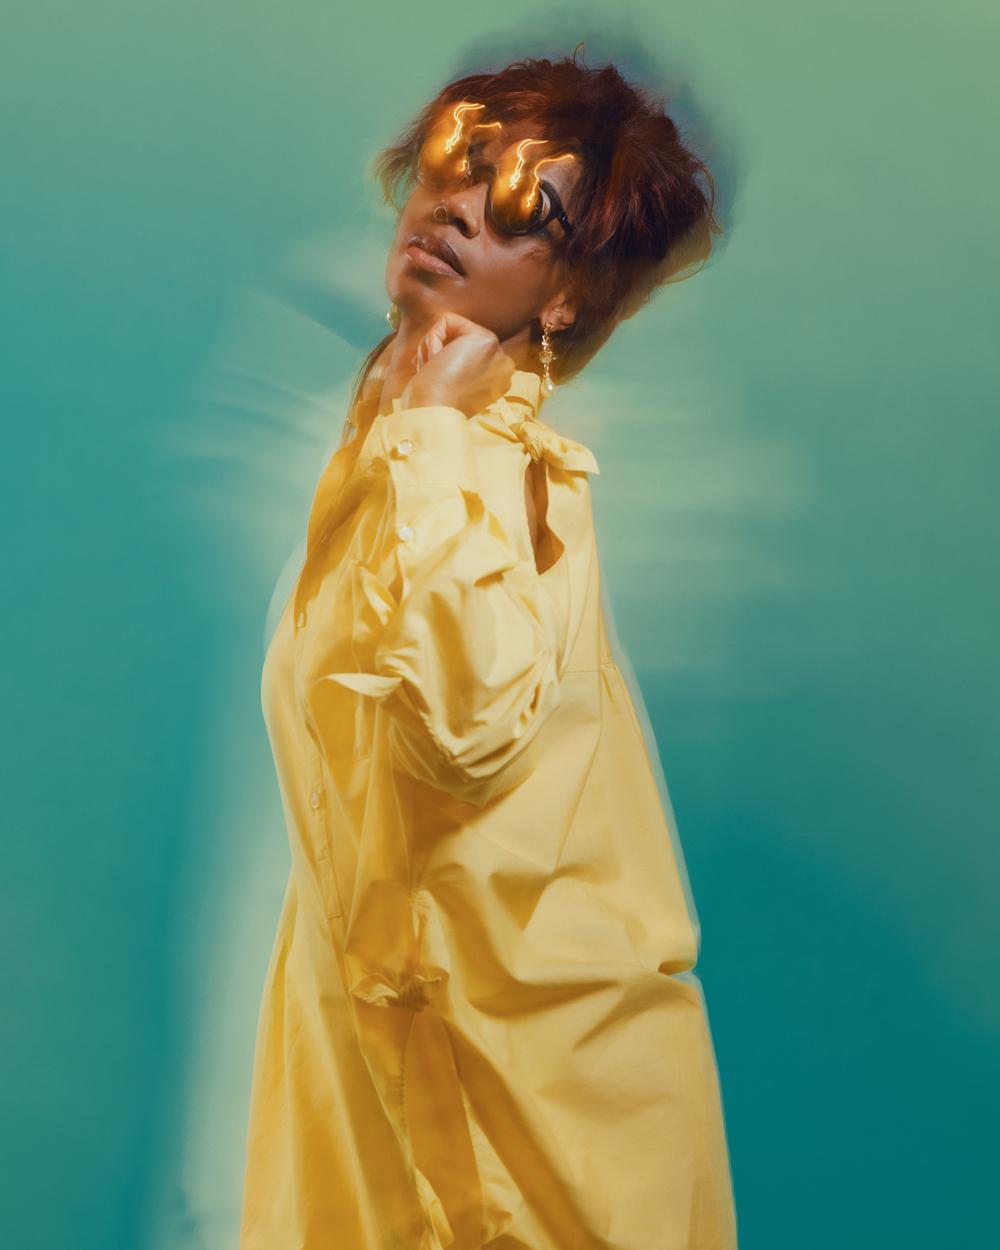 Santigold © Ryan Pfluger